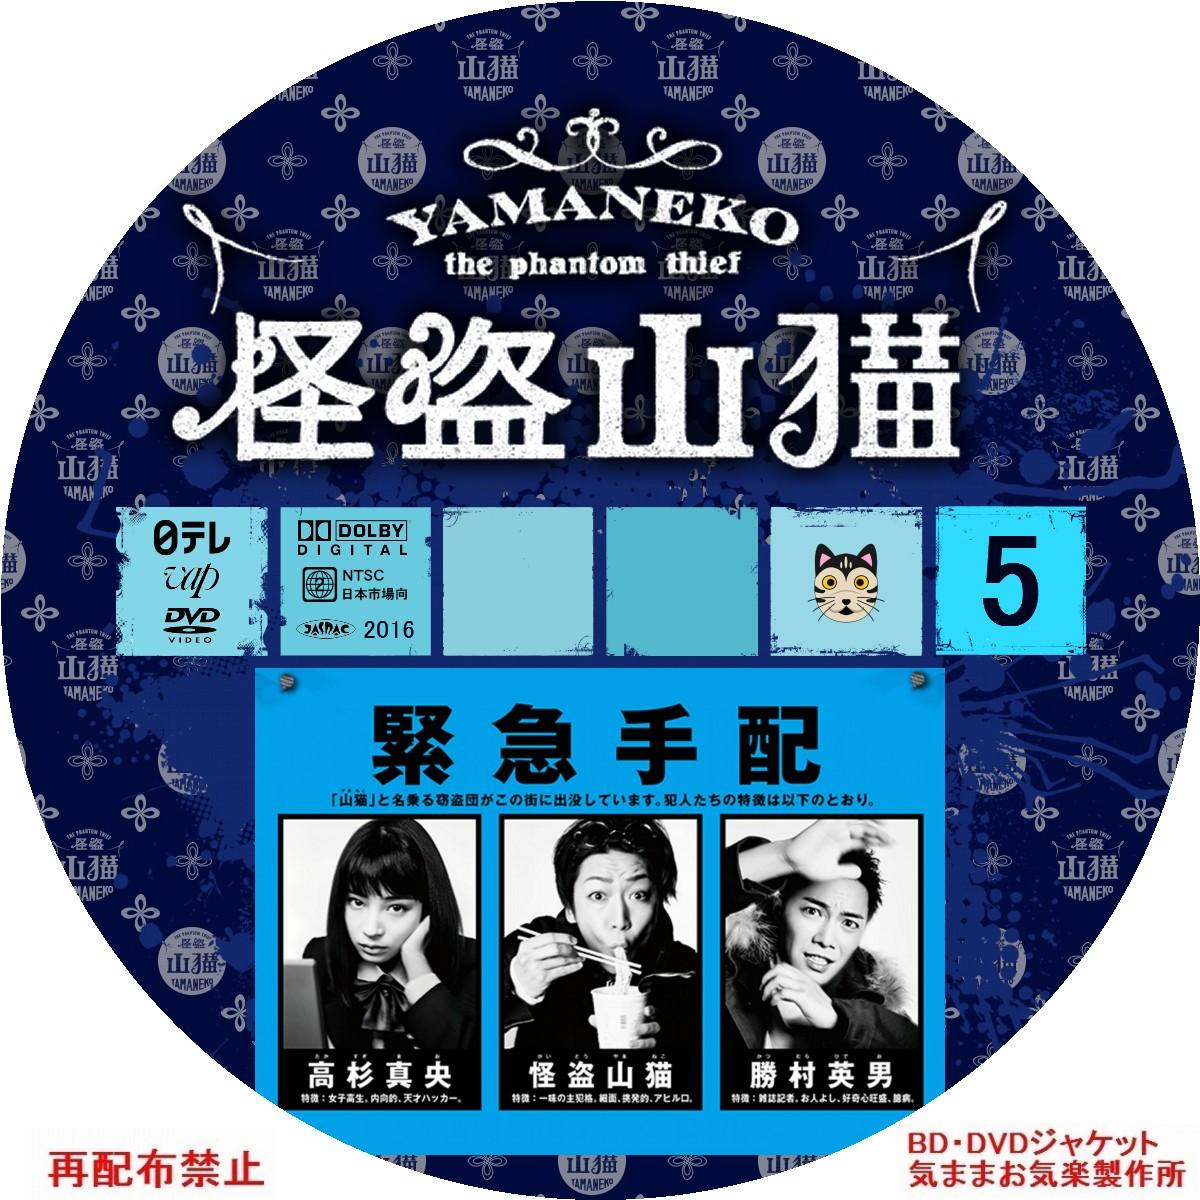 Kaitou_yamaneko_05.jpg